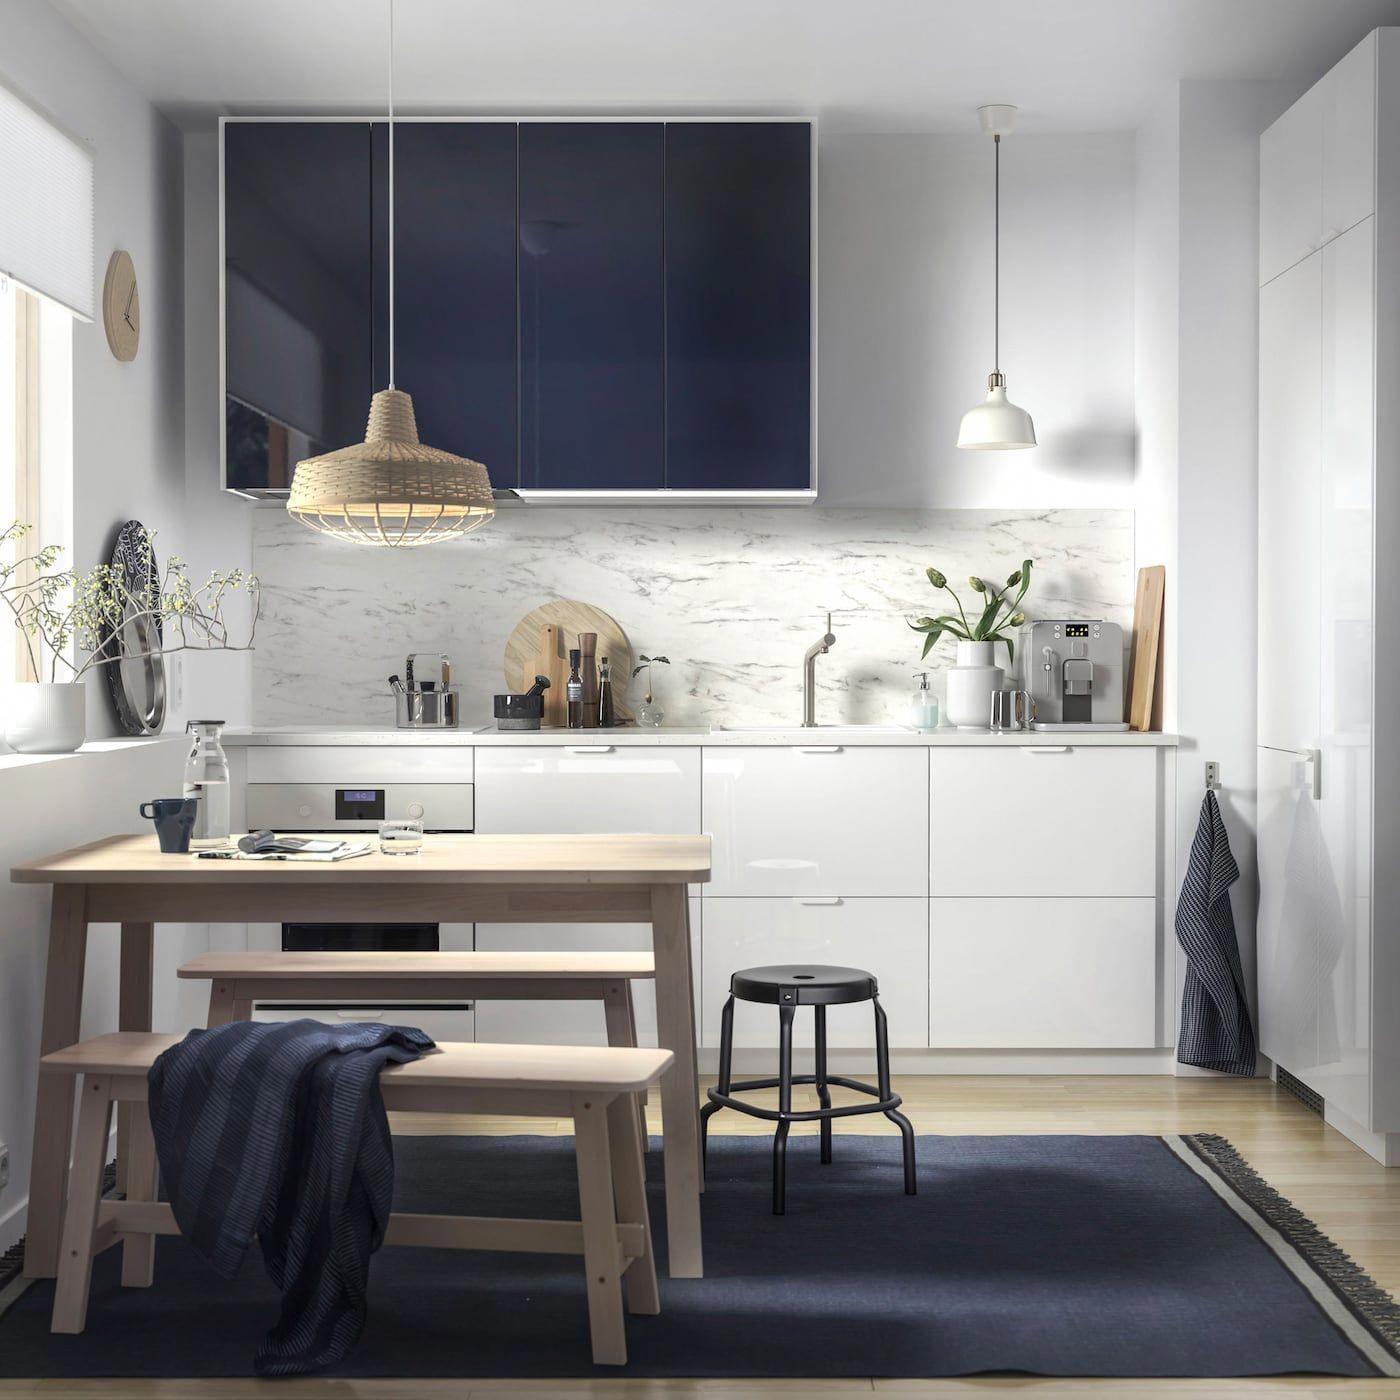 IKEA RINGHULT drawers and JÄRSTA glossy black blue kitchen ...